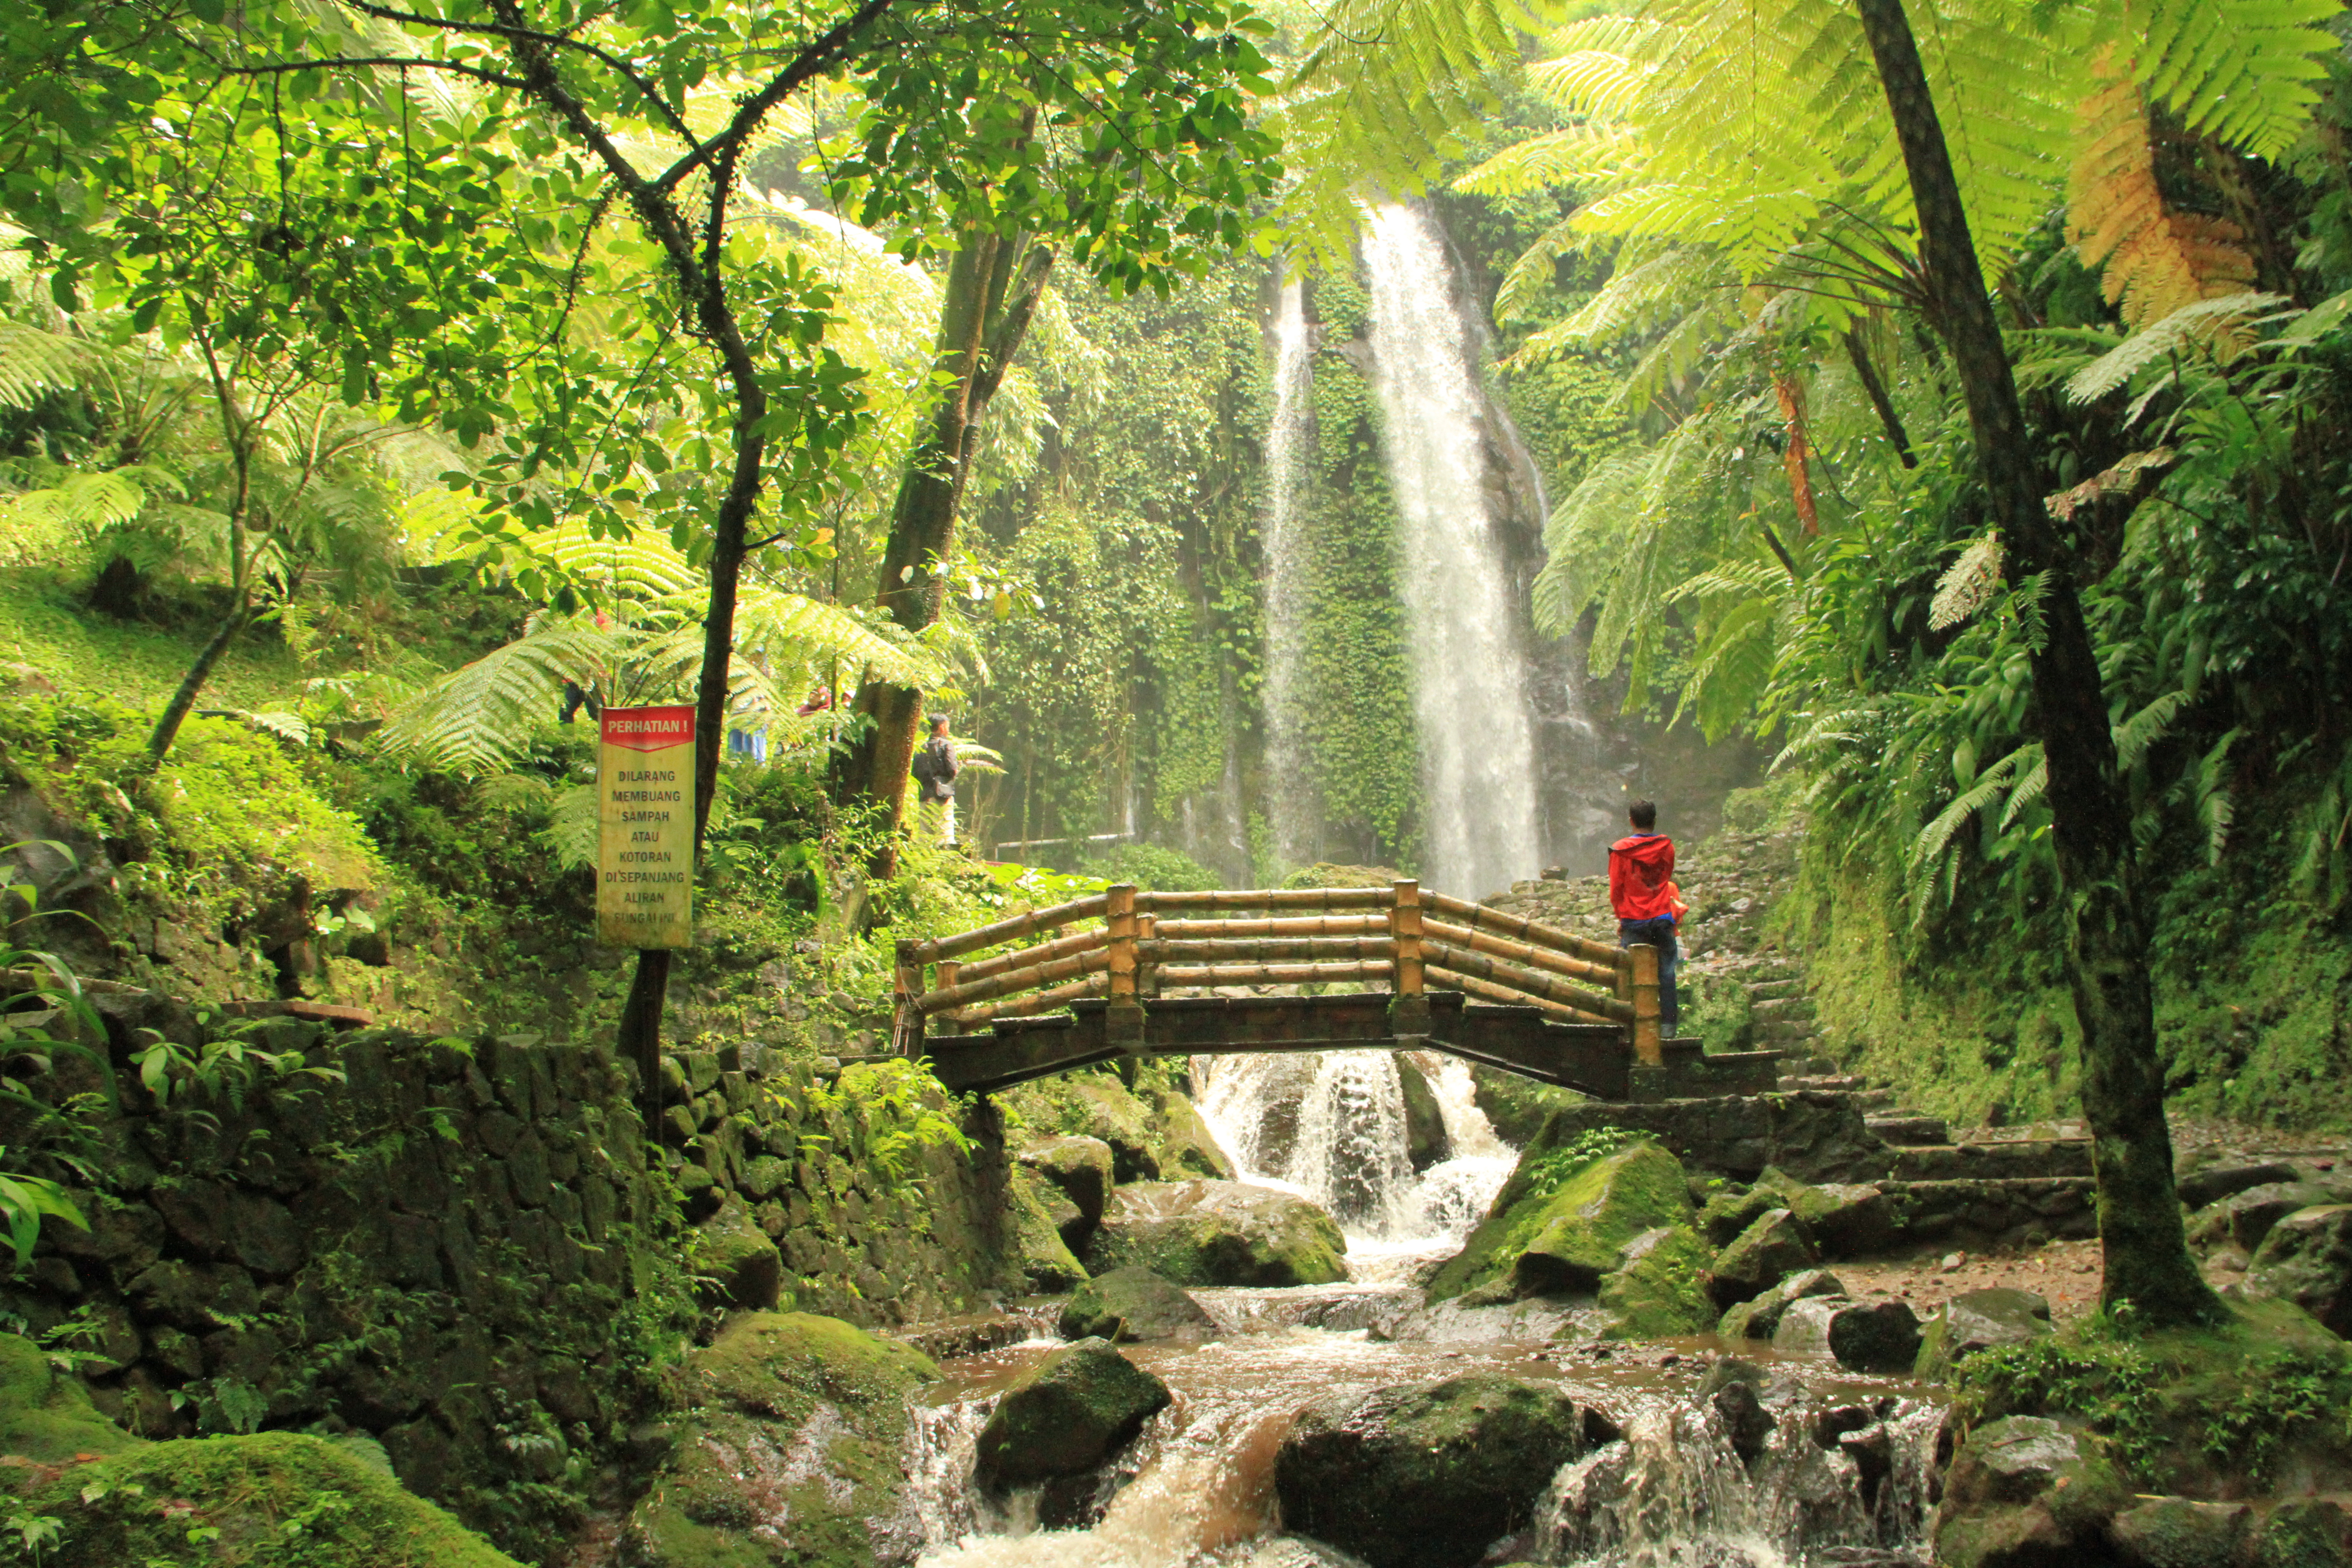 14 Tempat Wisata Sekitar Tawangmangu Yuk Piknik Foto Https Alonbiker